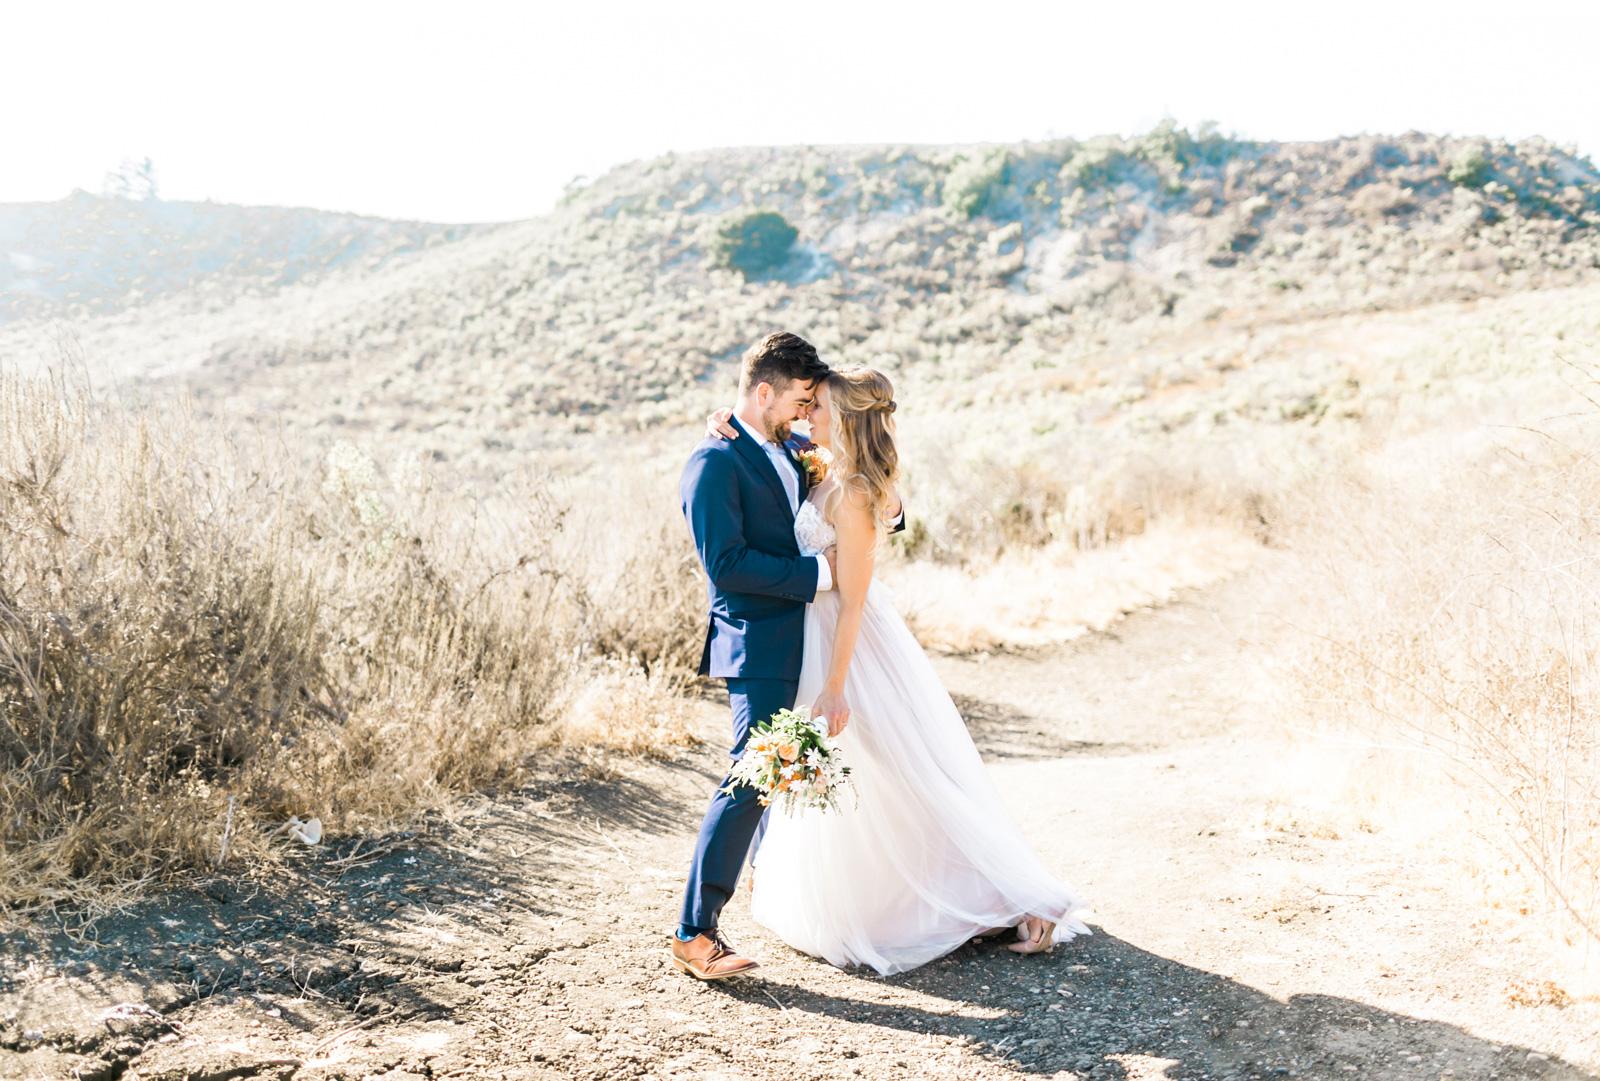 Style-Me-Pretty-San-Luis-Obispo-Wedding-Natalie-Schutt-Photography_10.jpg